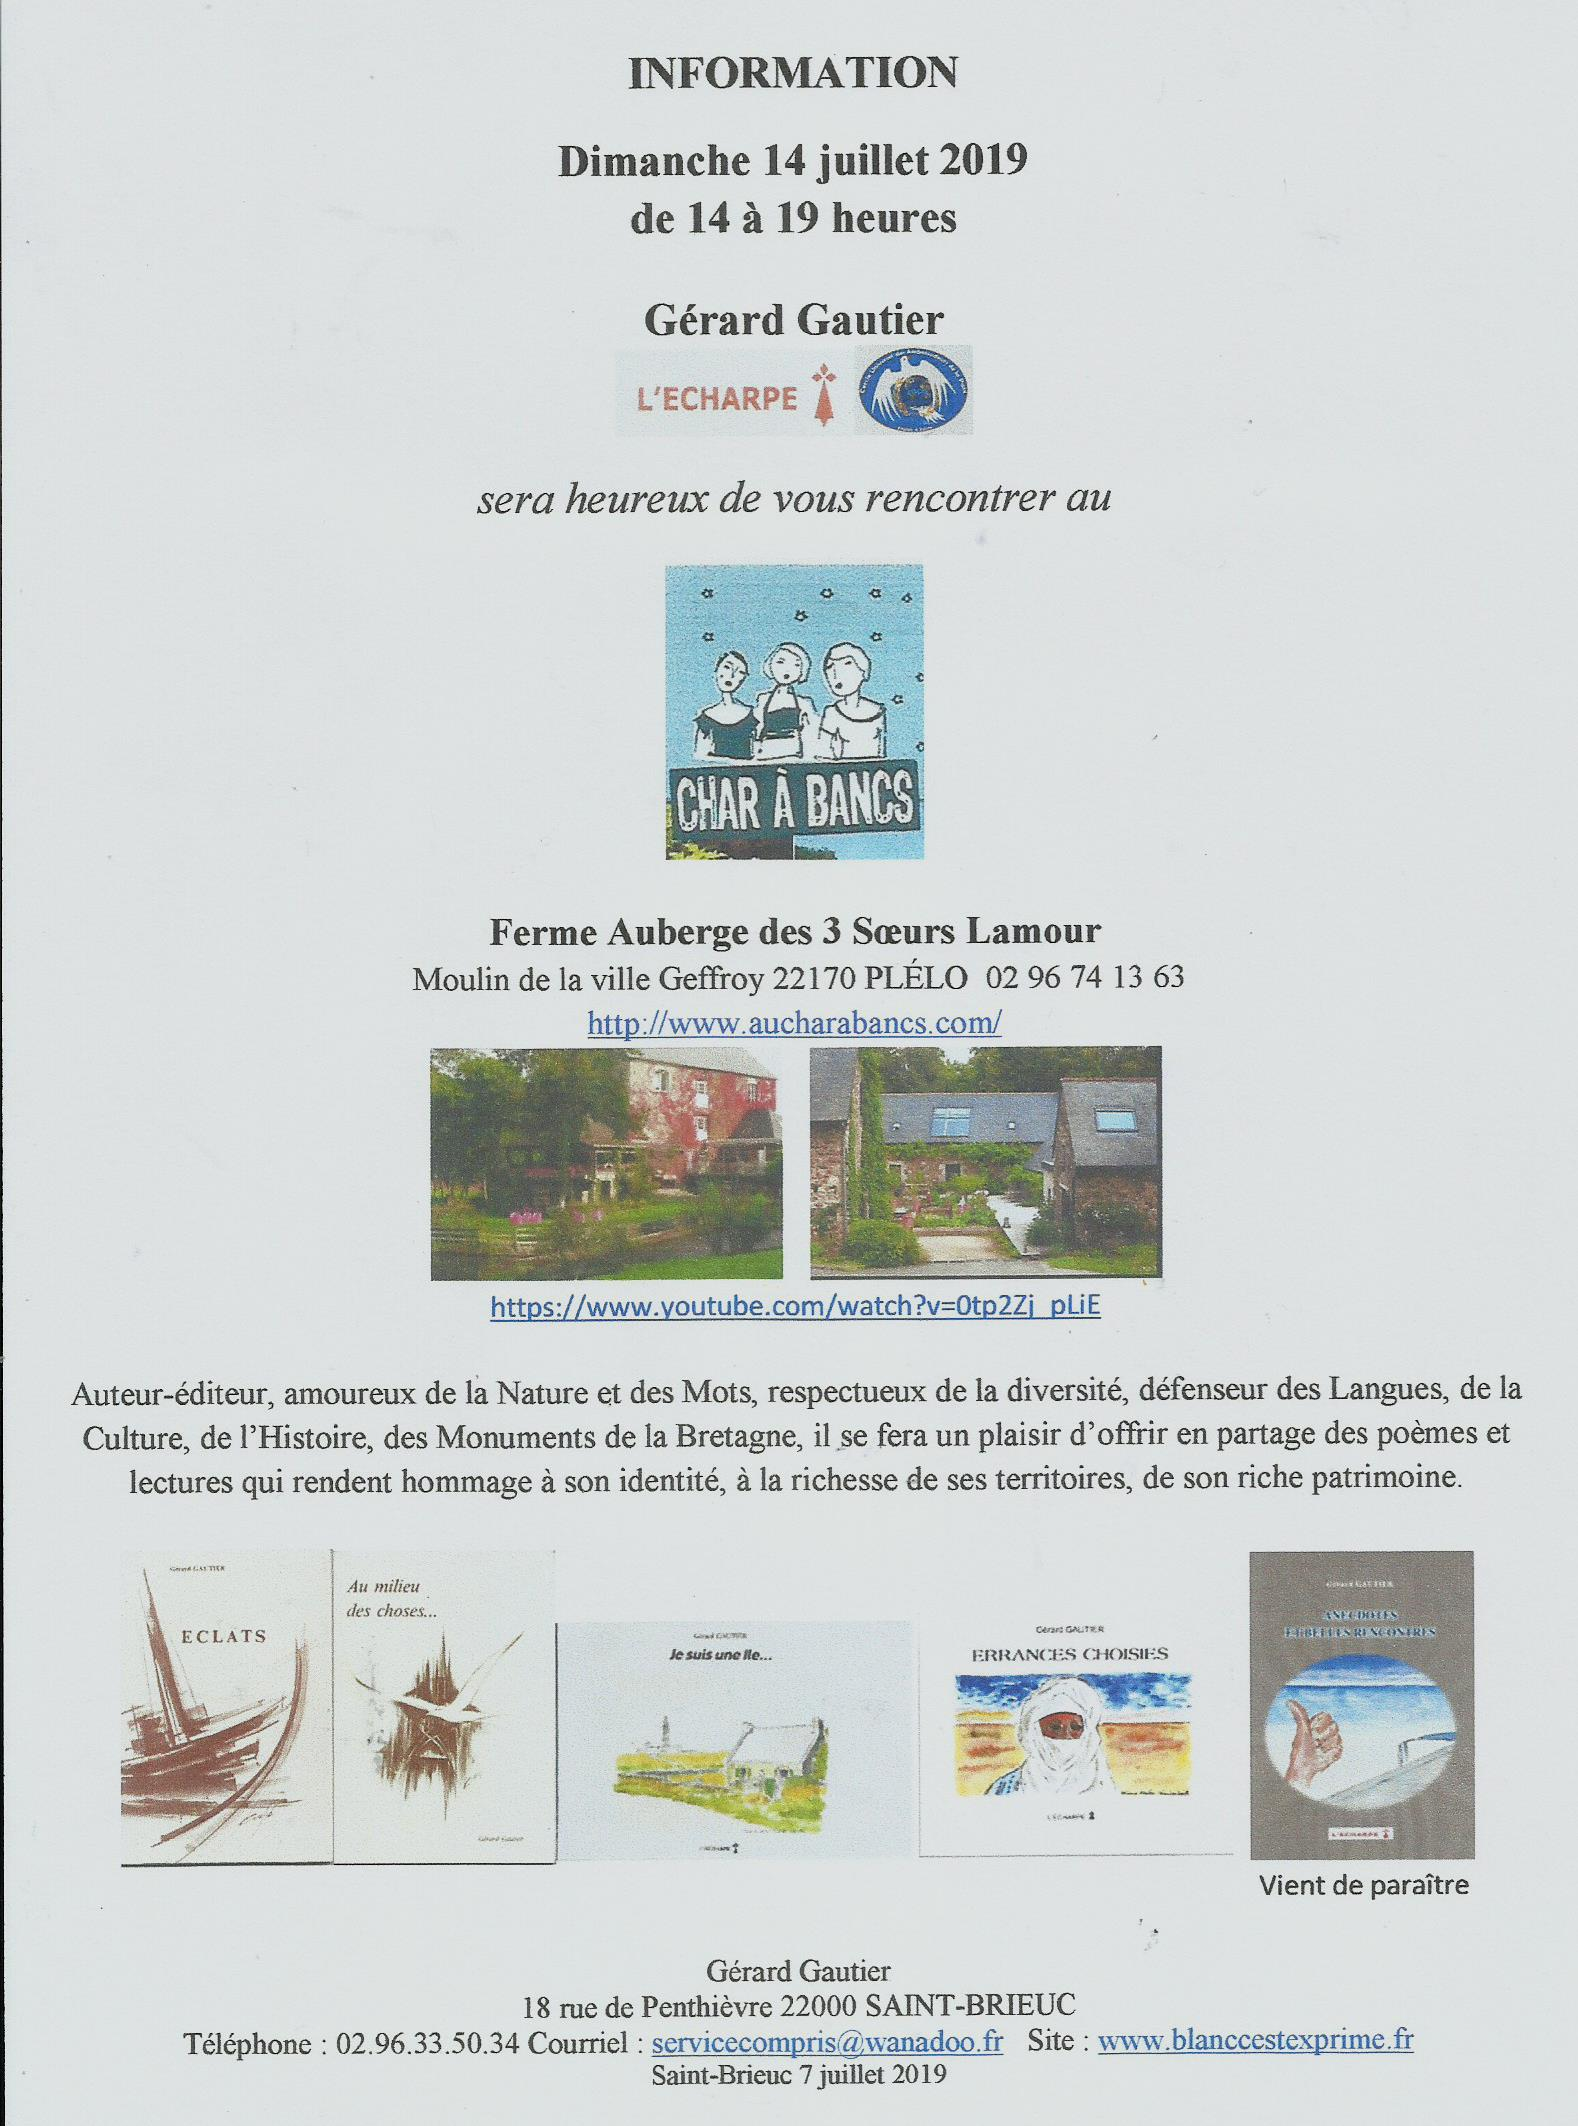 ECHARPE SALONS 2019 CHAR A BANCS 14 07